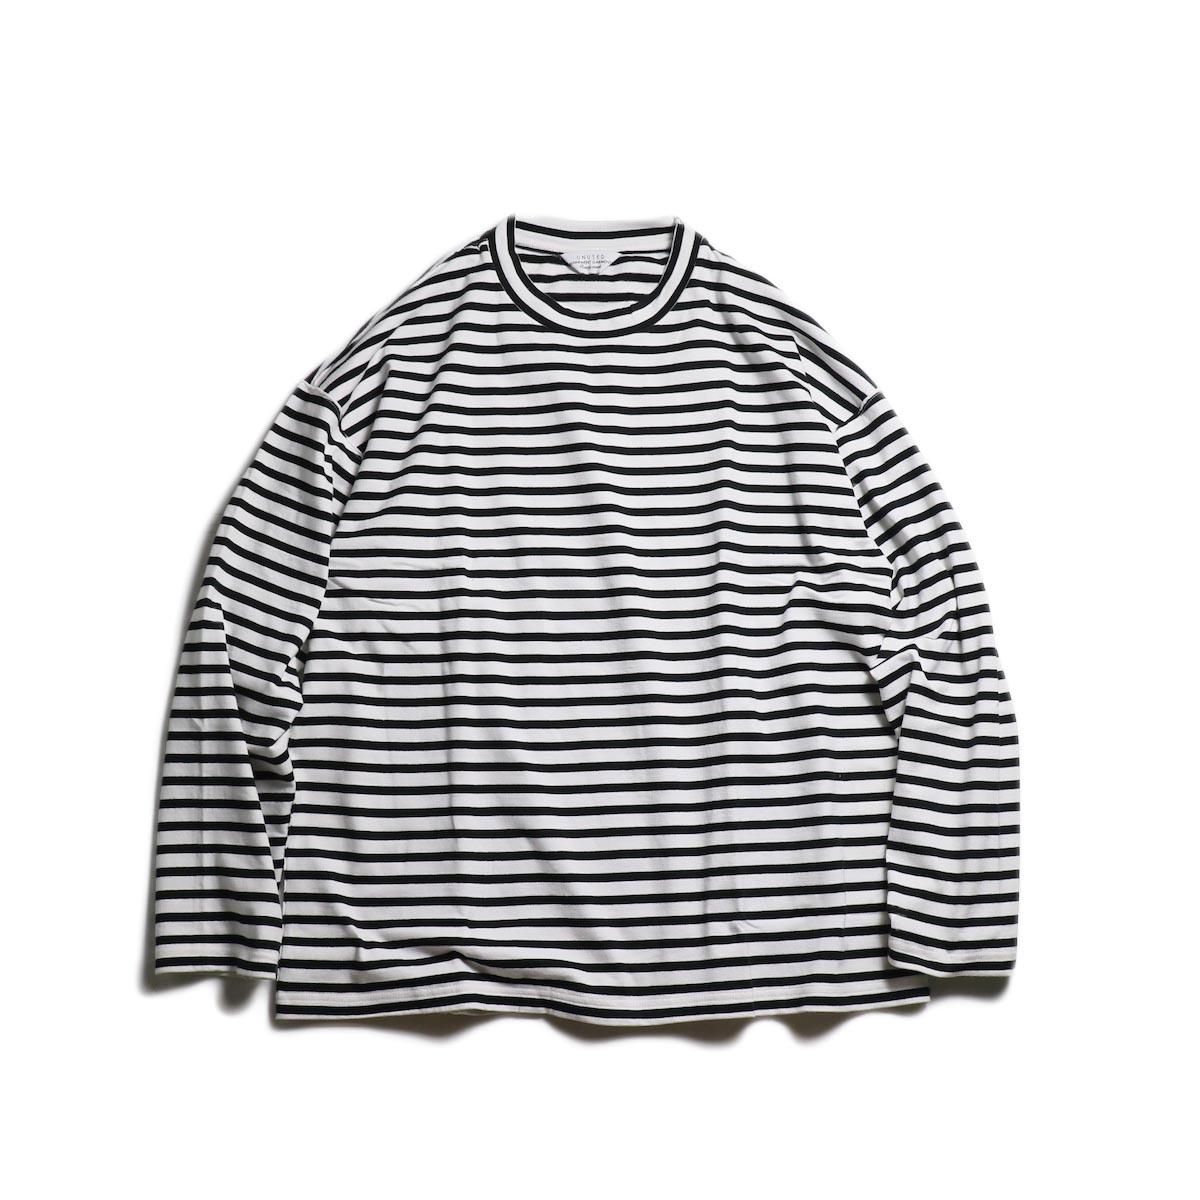 UNUSED / US1682 Long Sleeve Border T-Shirt -White/Black 正面